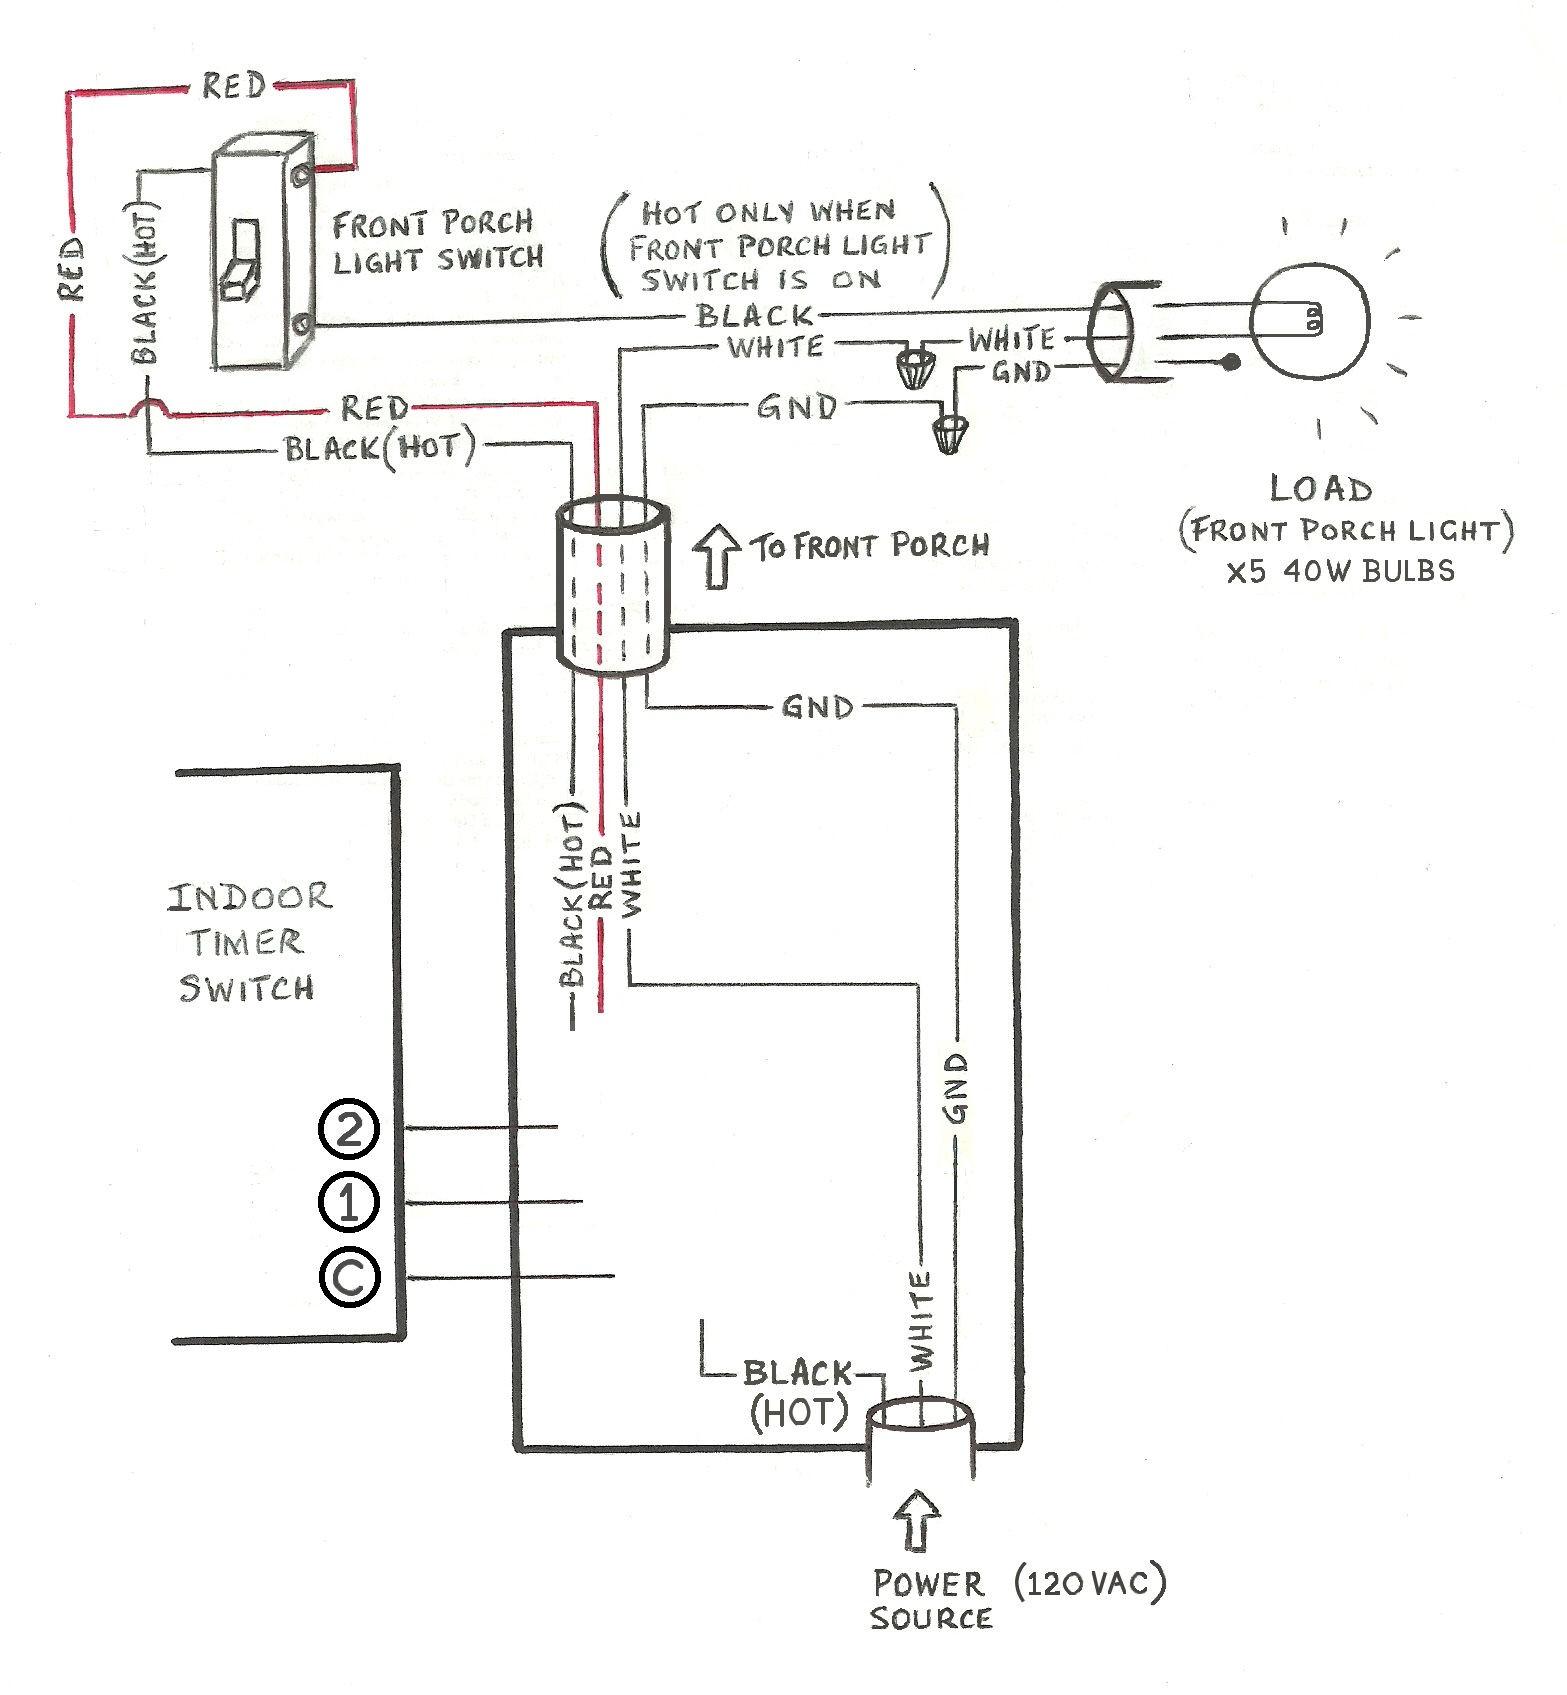 Wiring Diagram Way Light Switch Need Help Honeywell Digital Timer Home Ojtpc Gang Uk 2 Crabtree